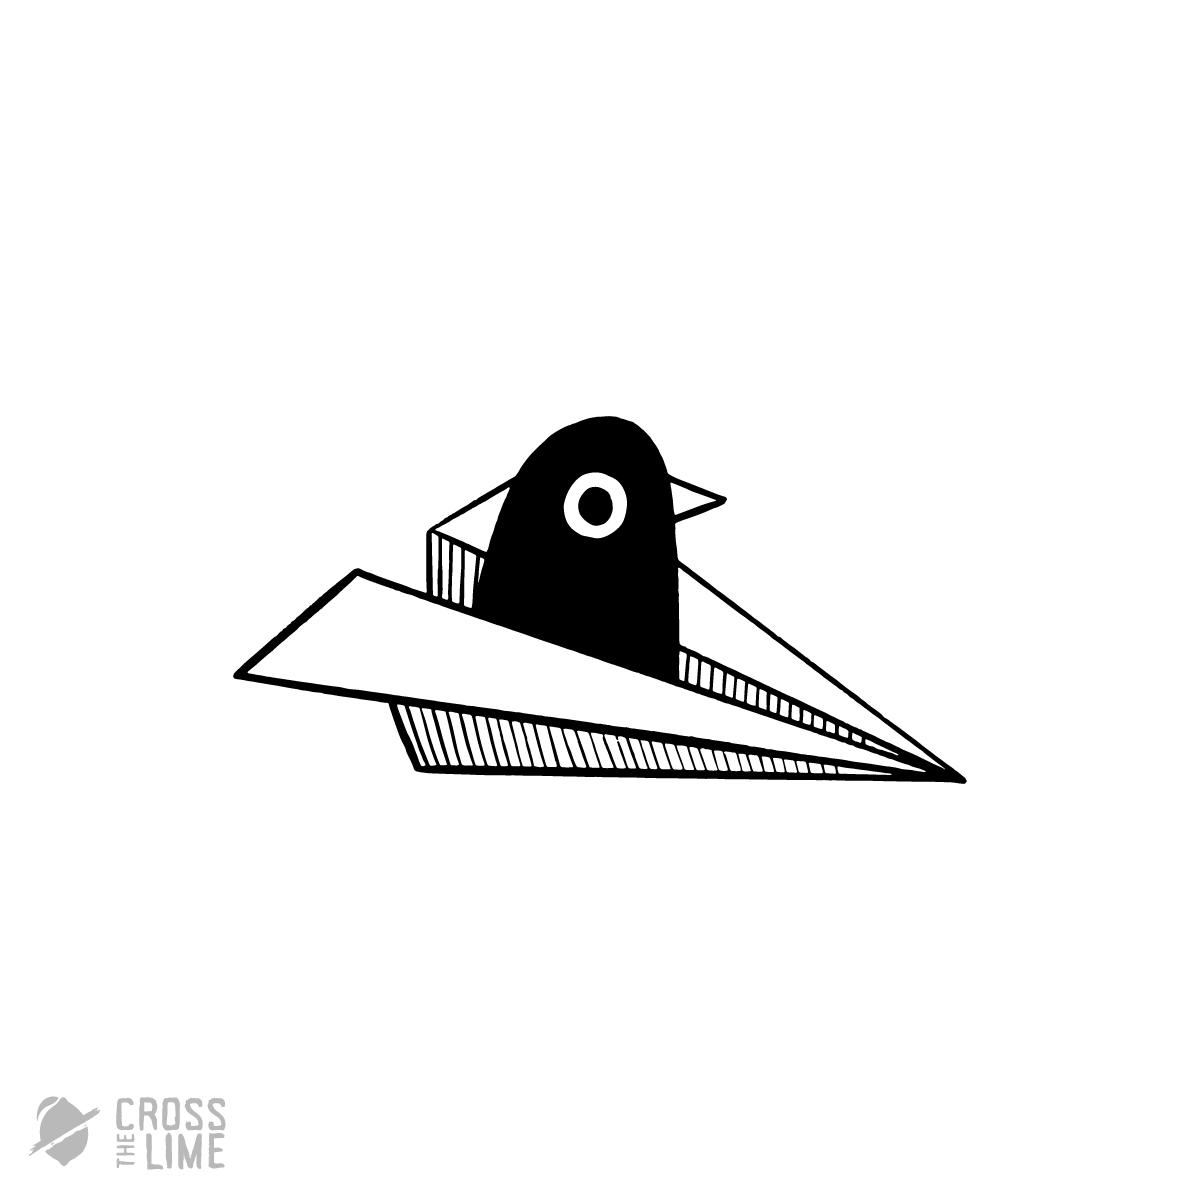 Lazy bird logo